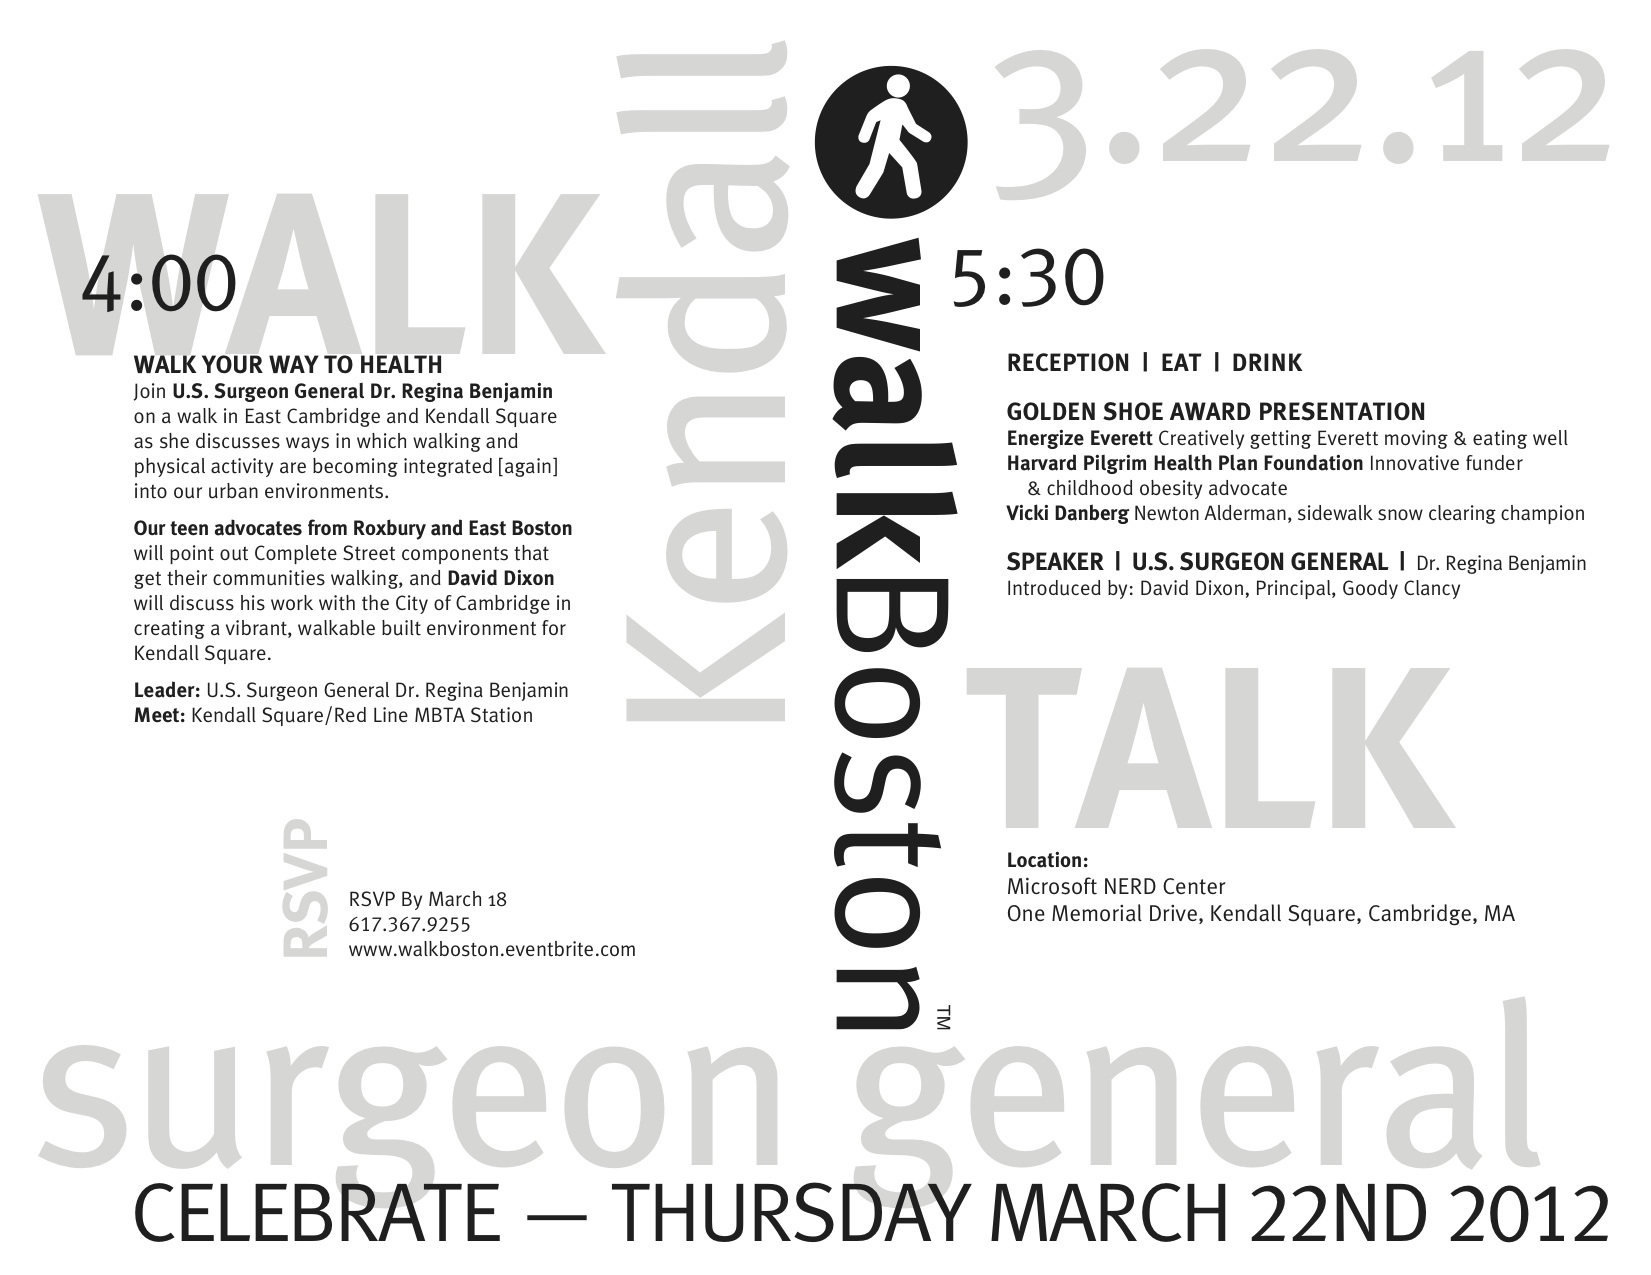 Annual Walk & Celebration Save the Date